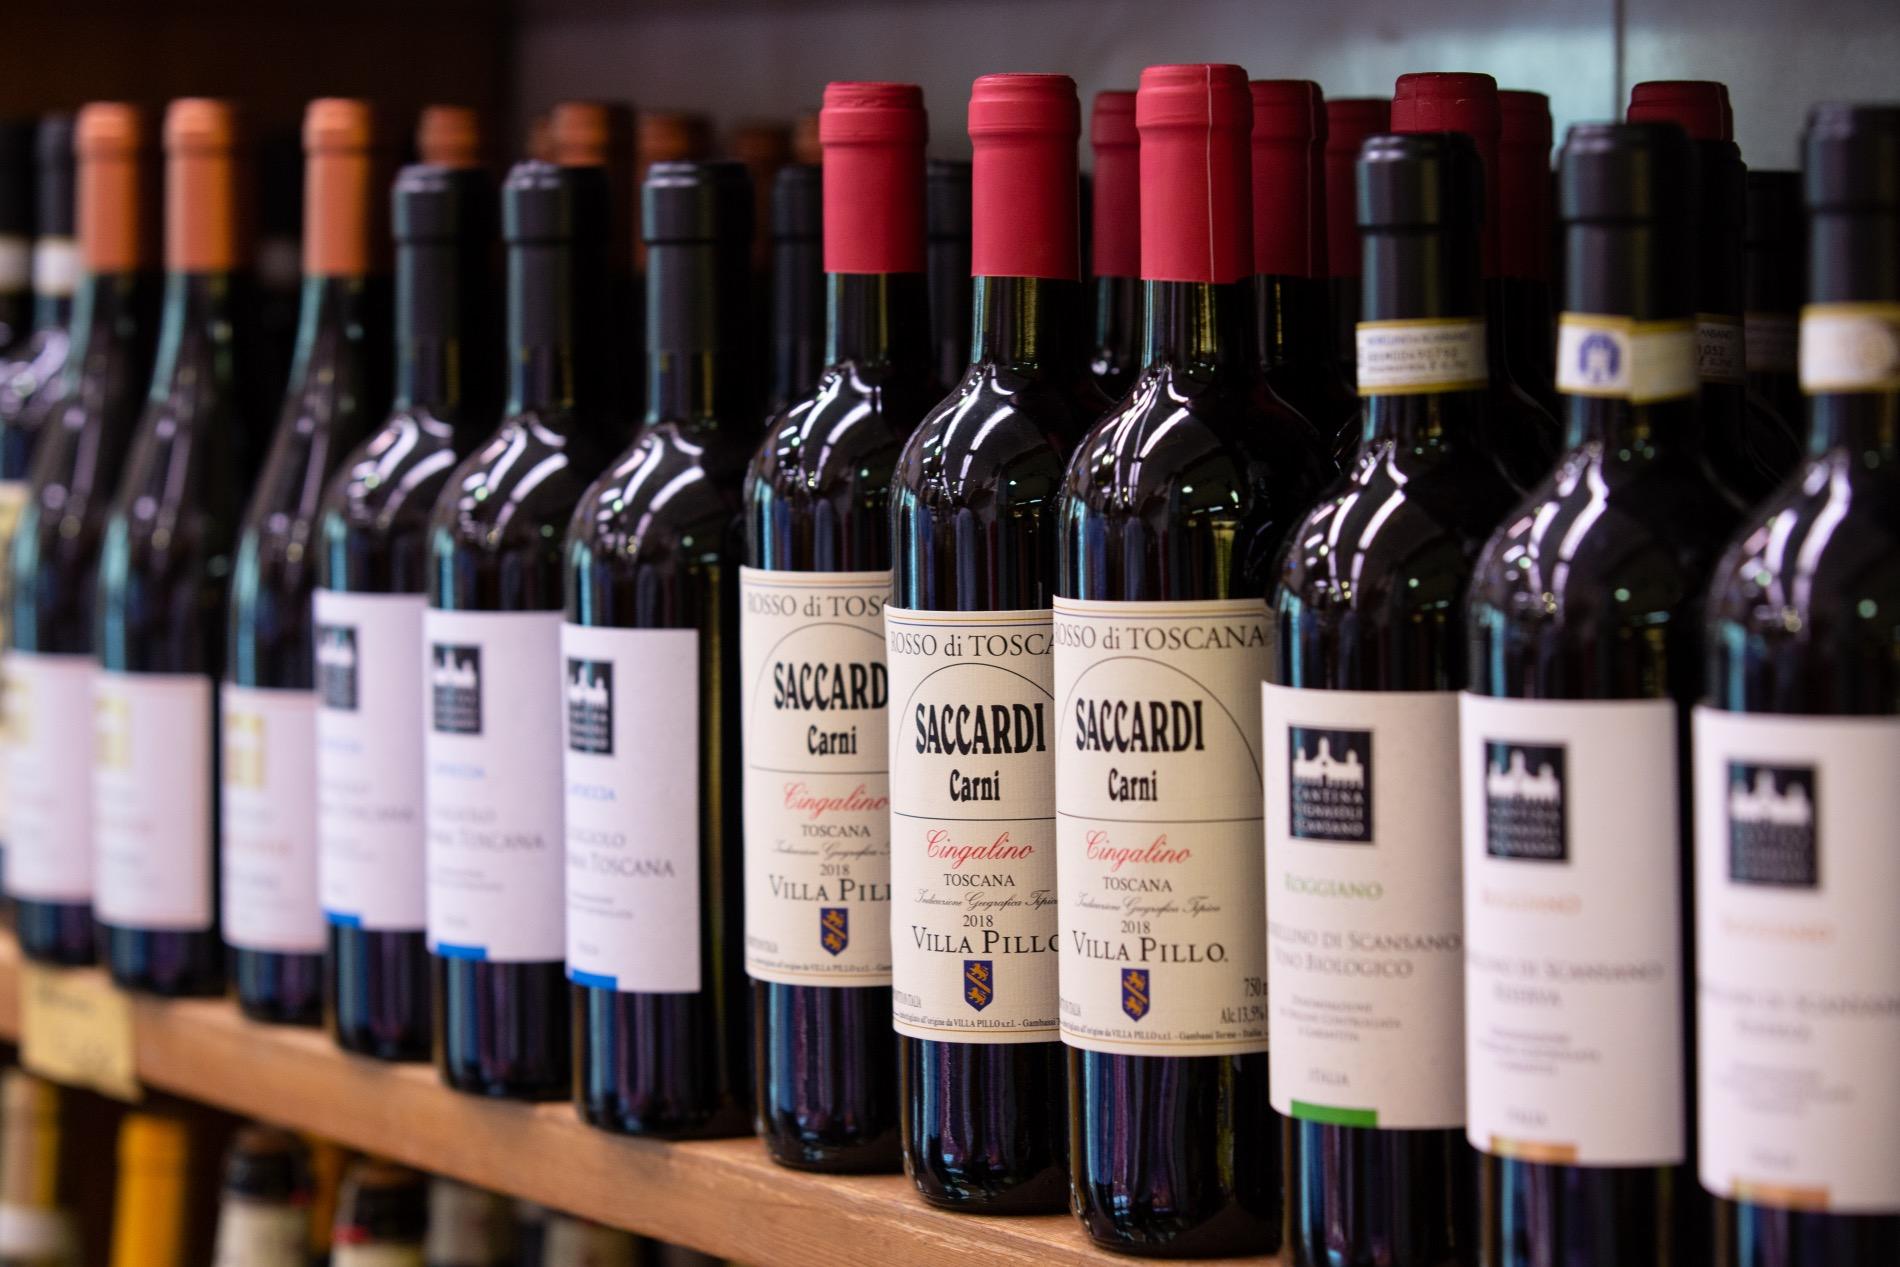 bottiglie di vino saccardi